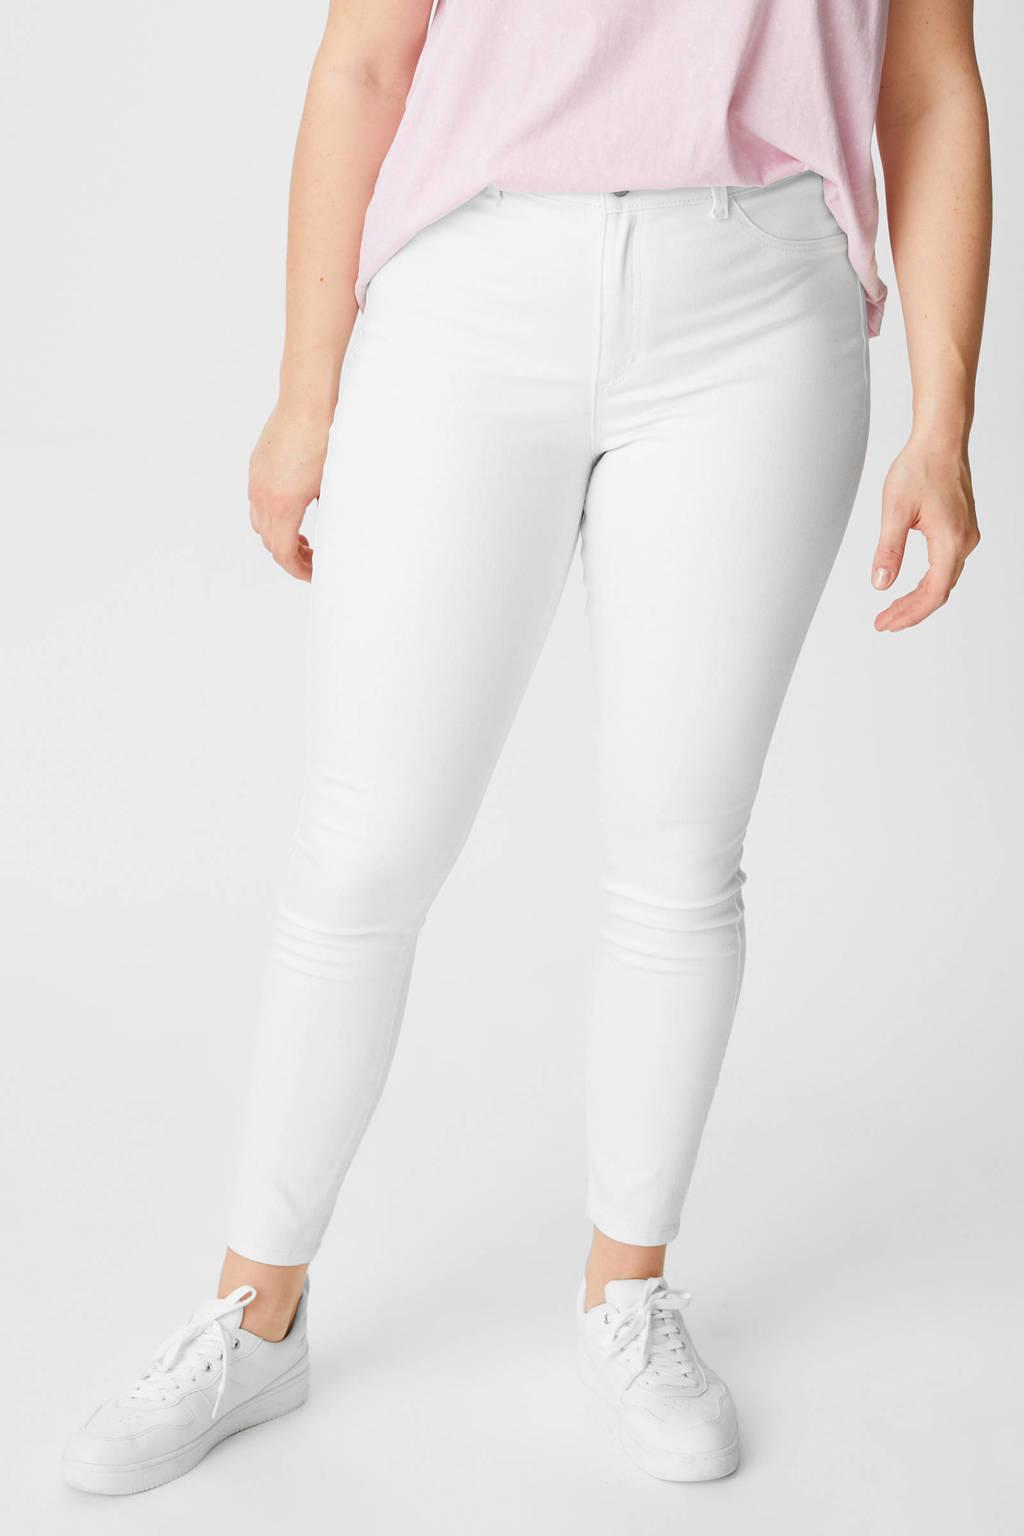 C&A XL Clockhouse high waist super skinny jeans wit, Wit